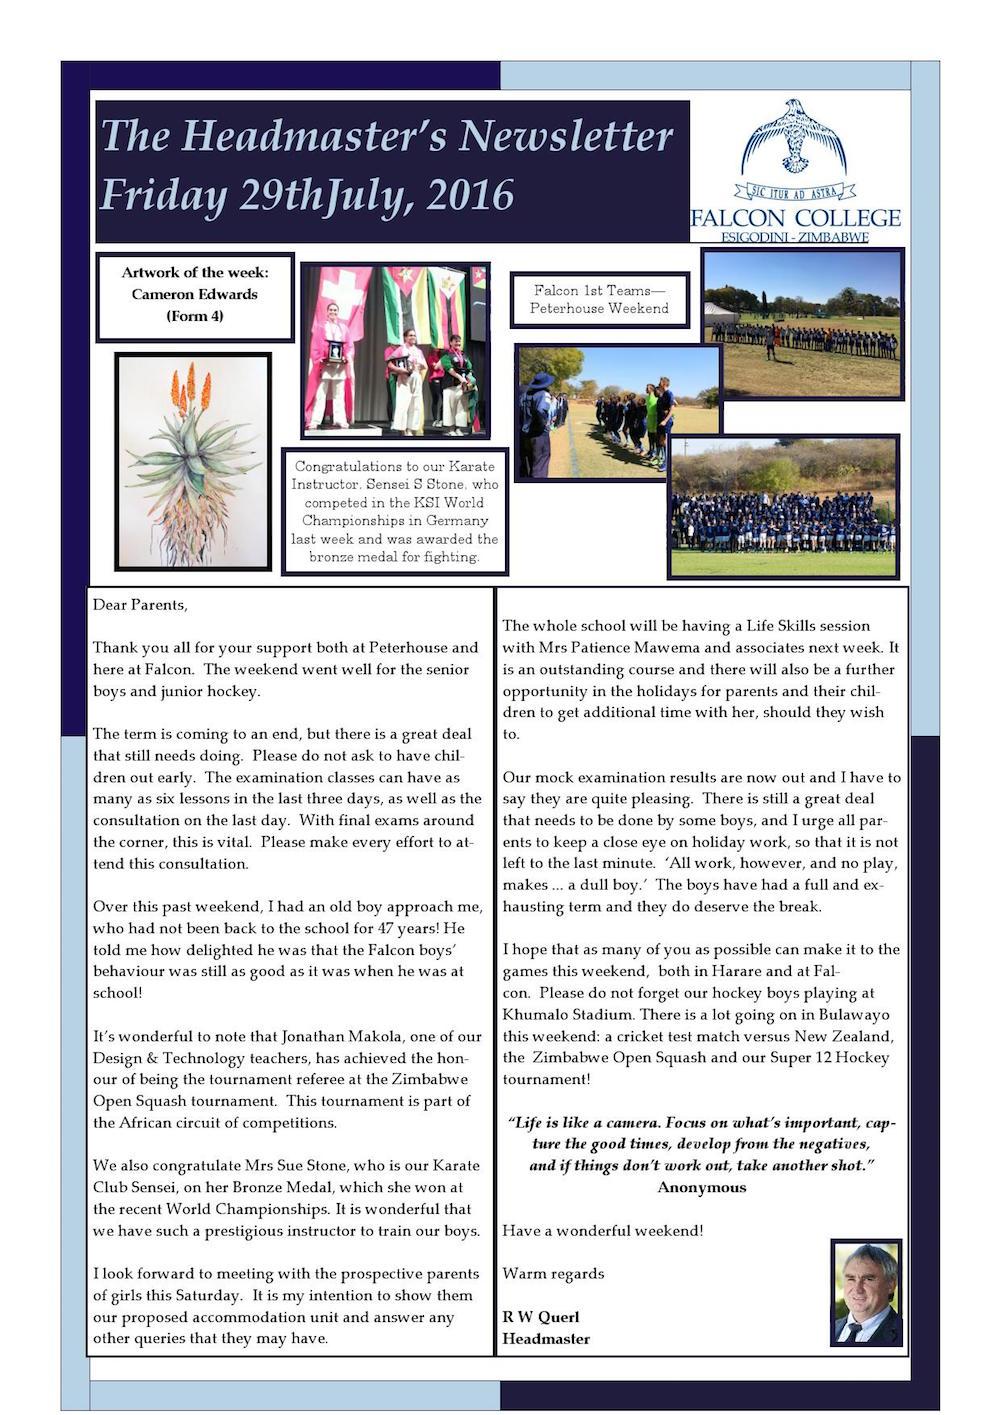 Headmaster's Newsletter Friday 29th July 2016 edited_000001